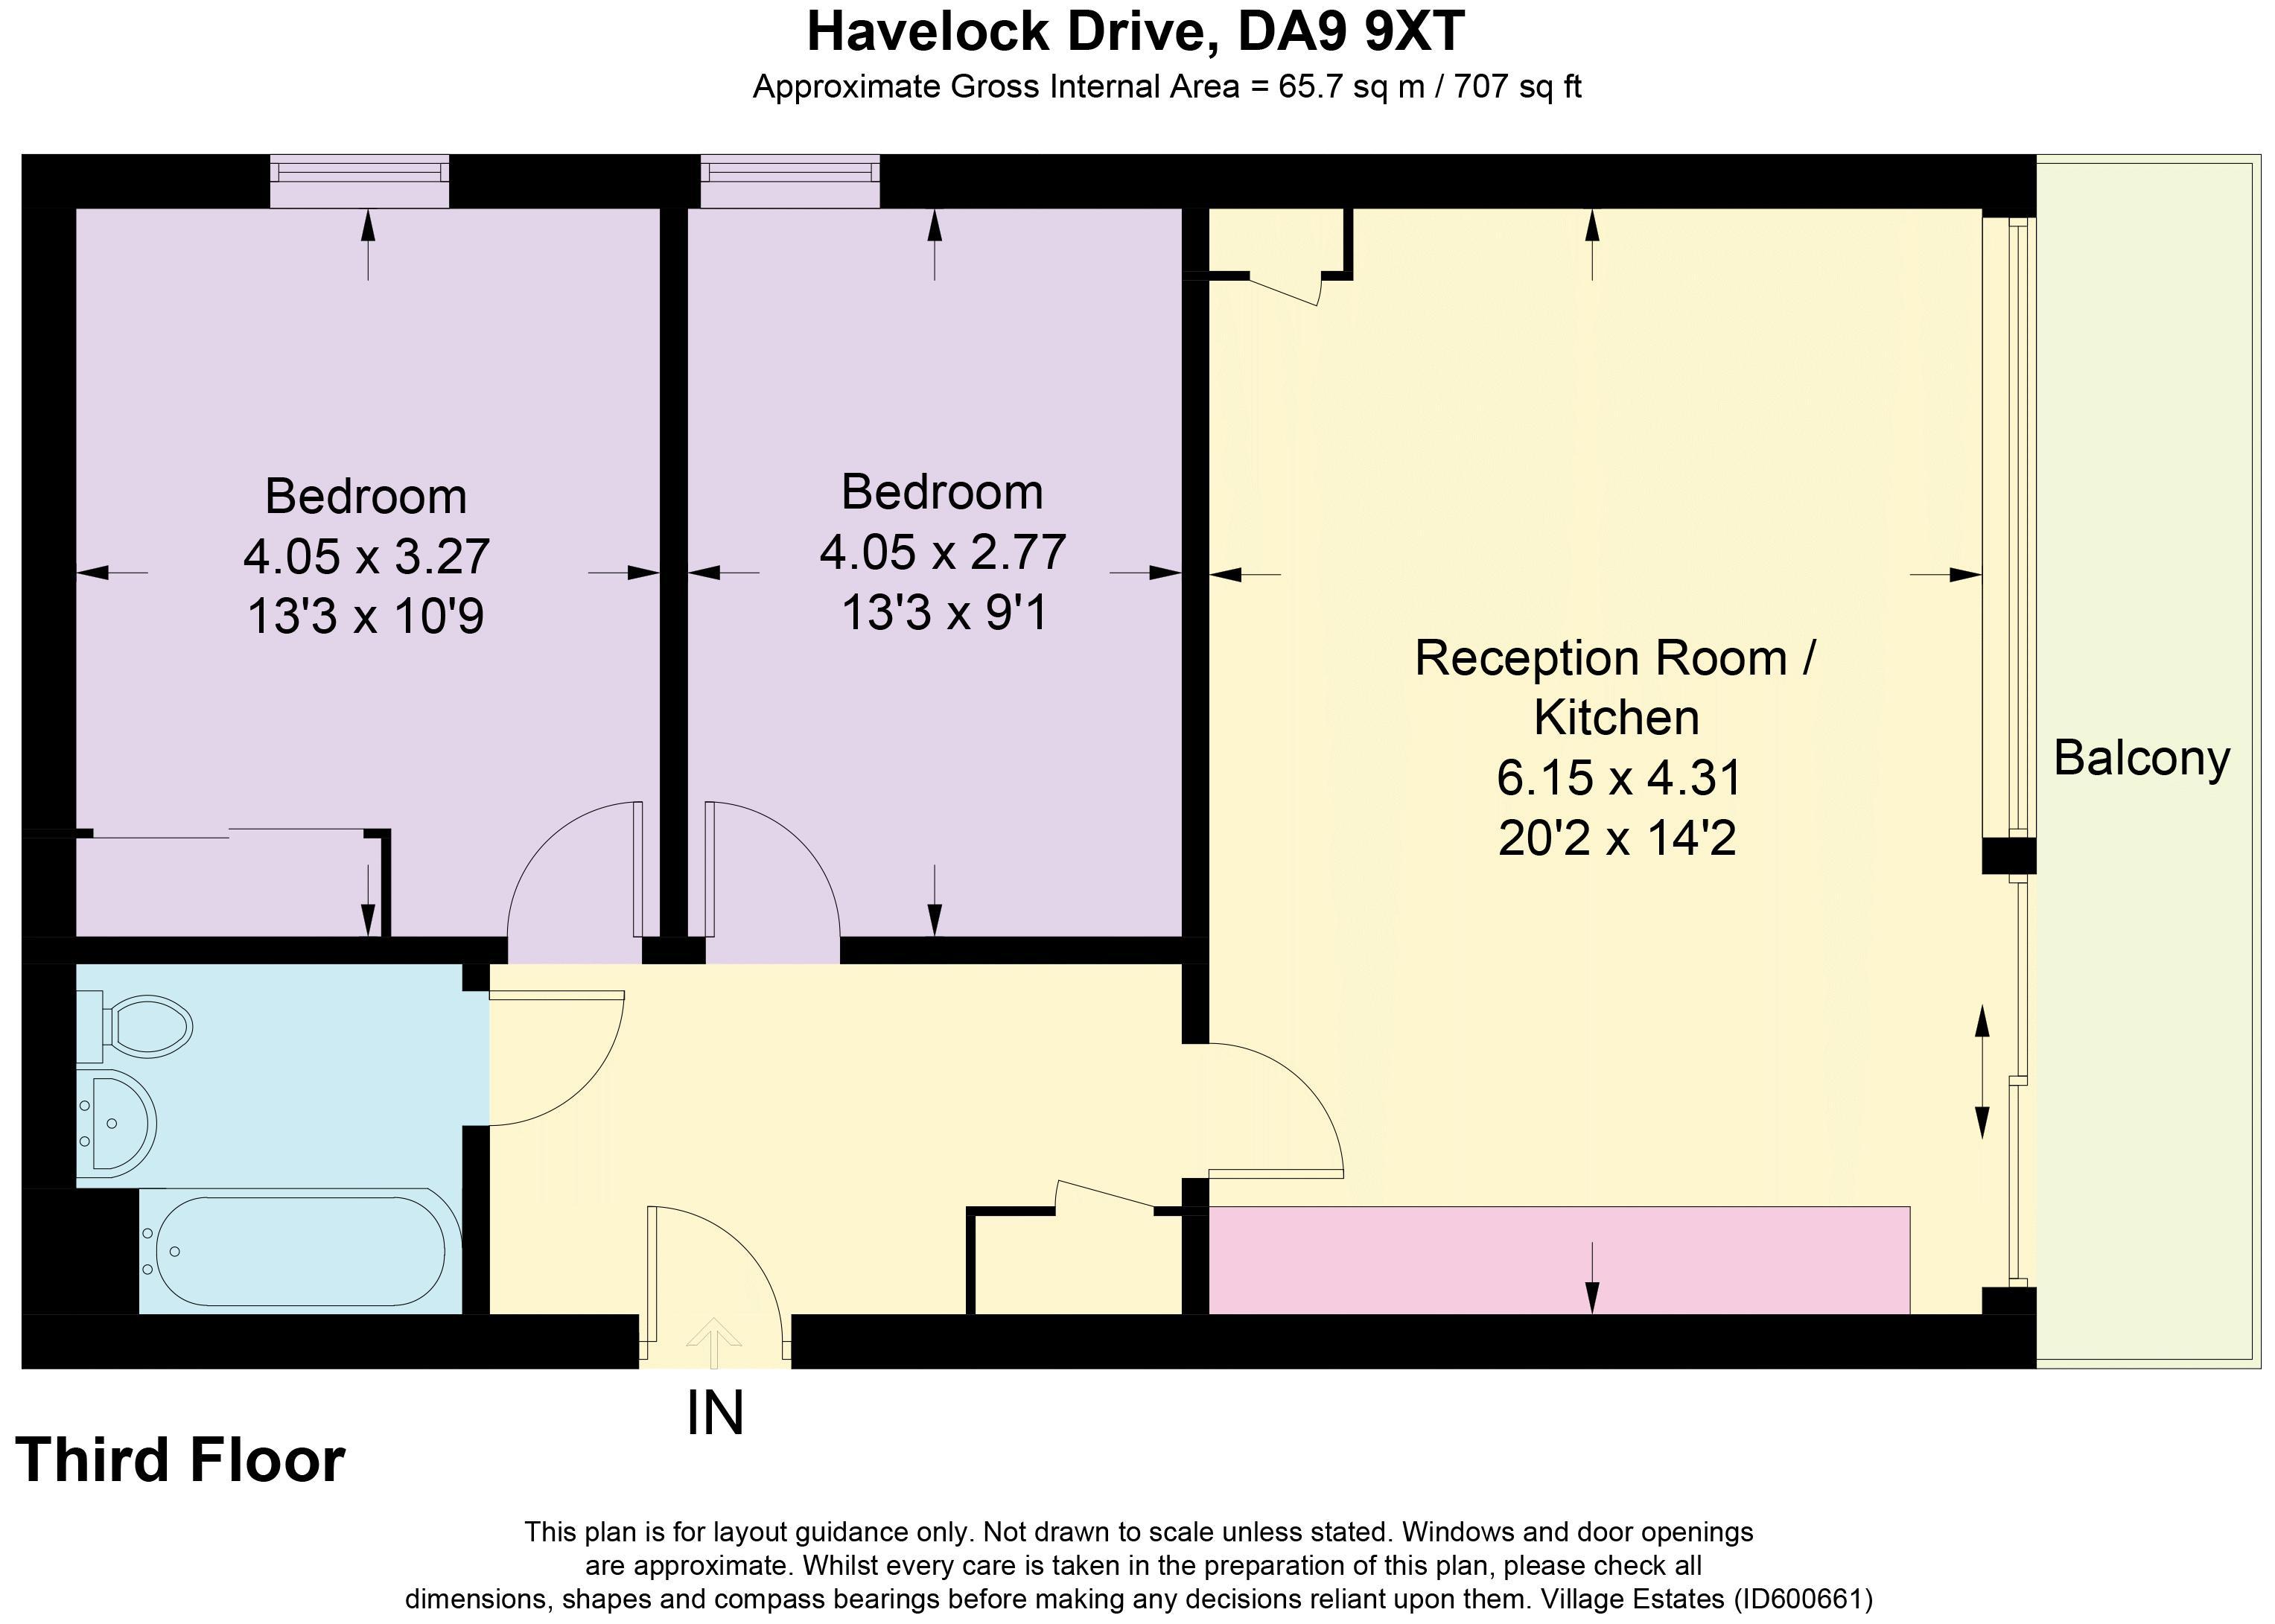 137 Havelock Drive